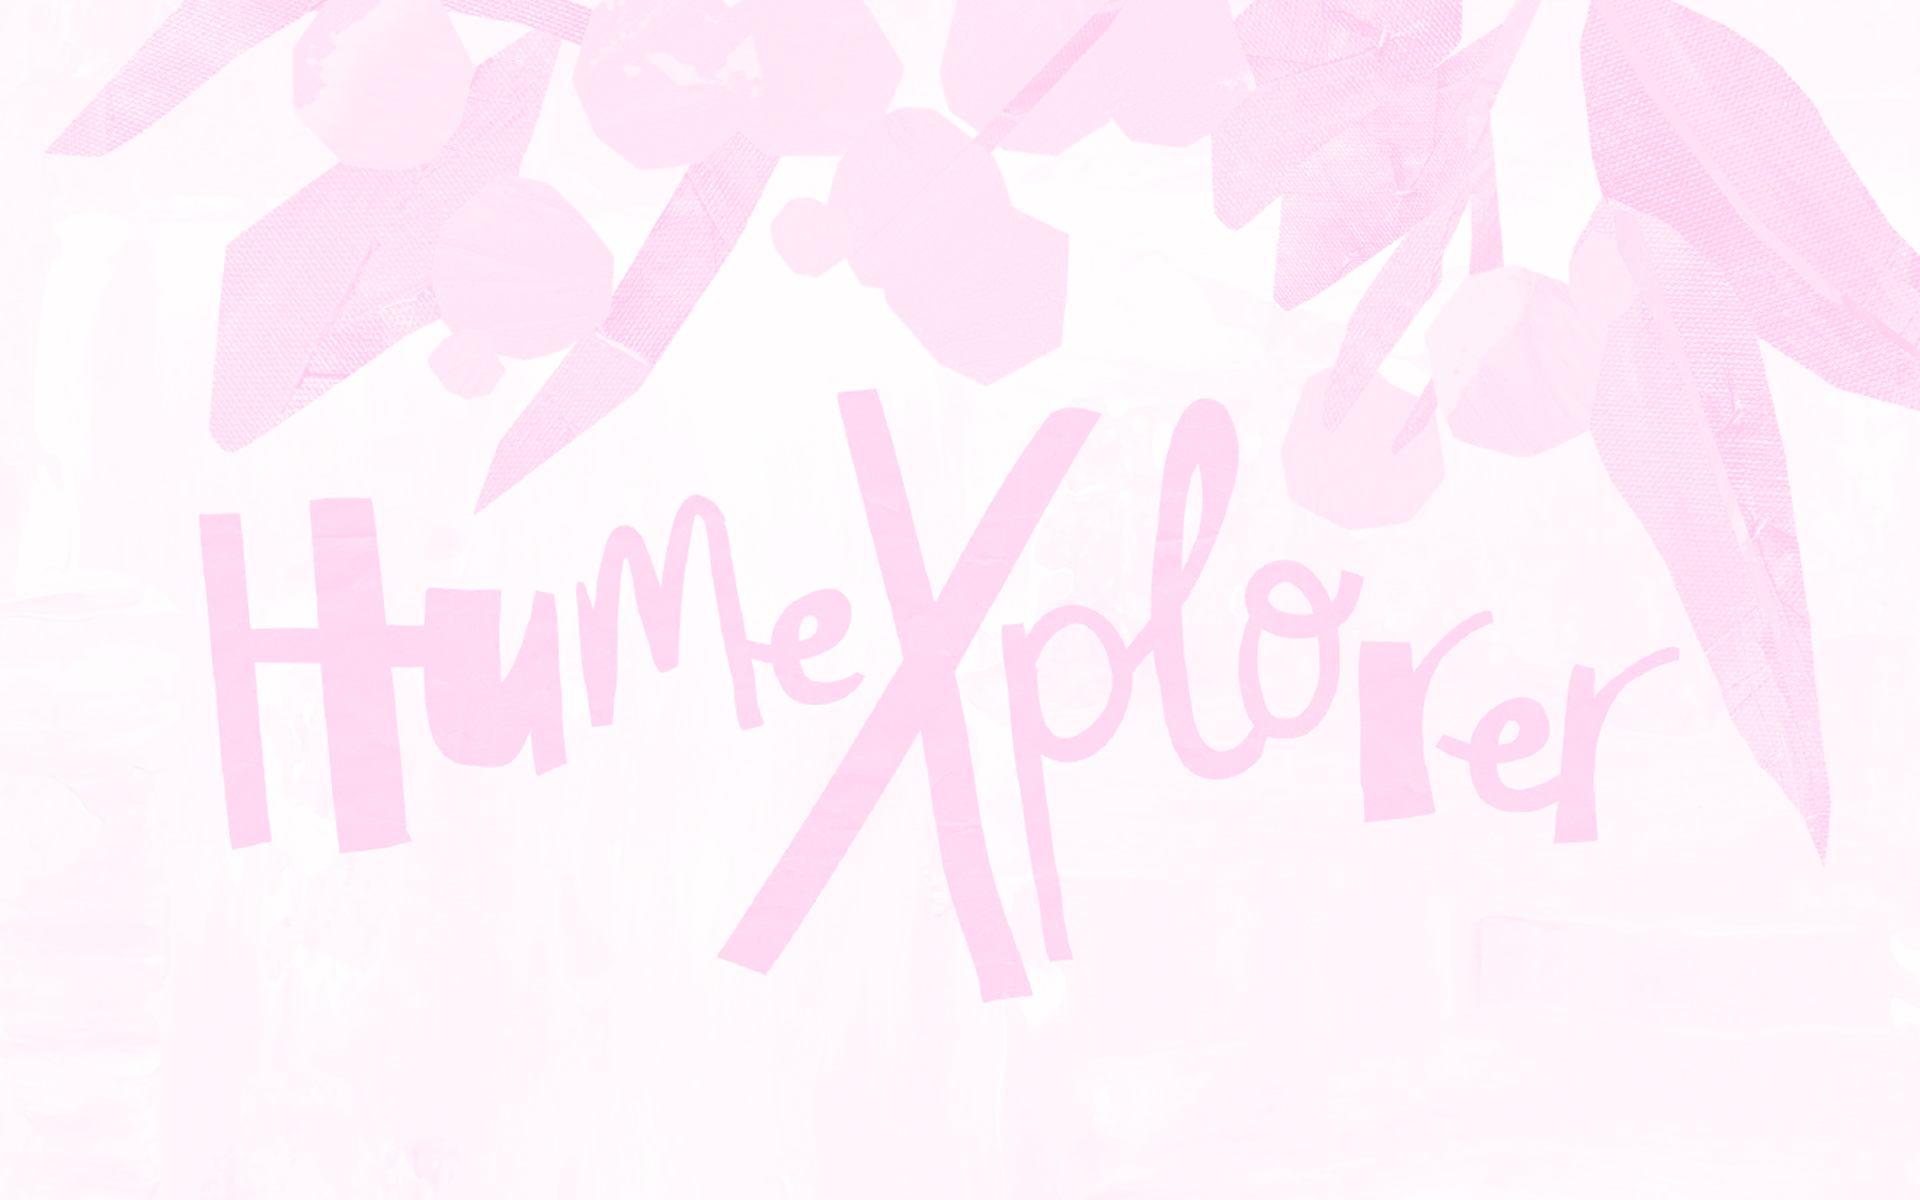 HumeXplorer Illustration and Design